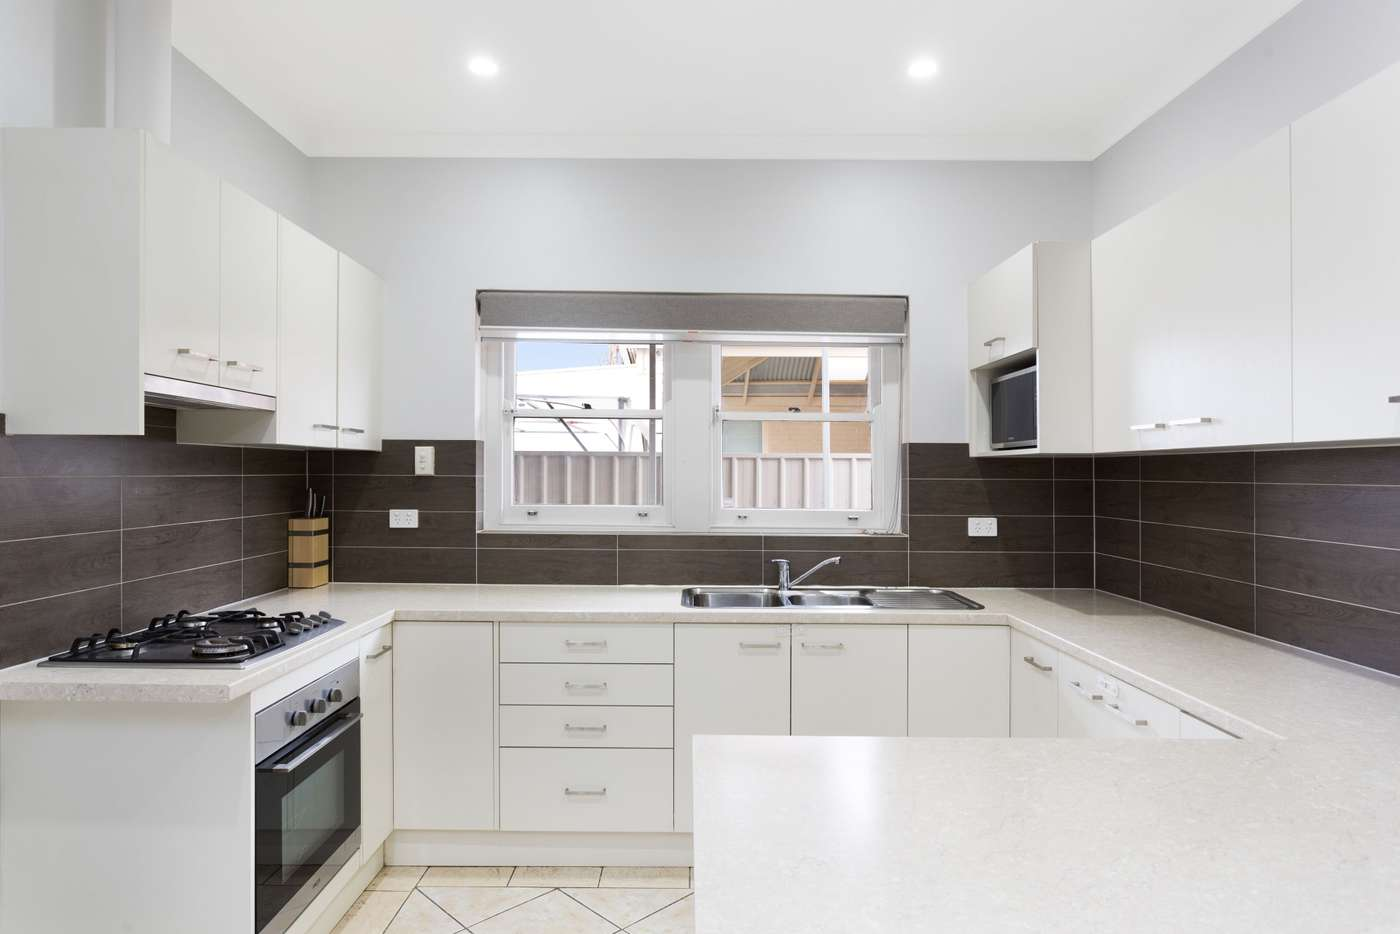 Main view of Homely house listing, 38 King Street, Alberton SA 5014